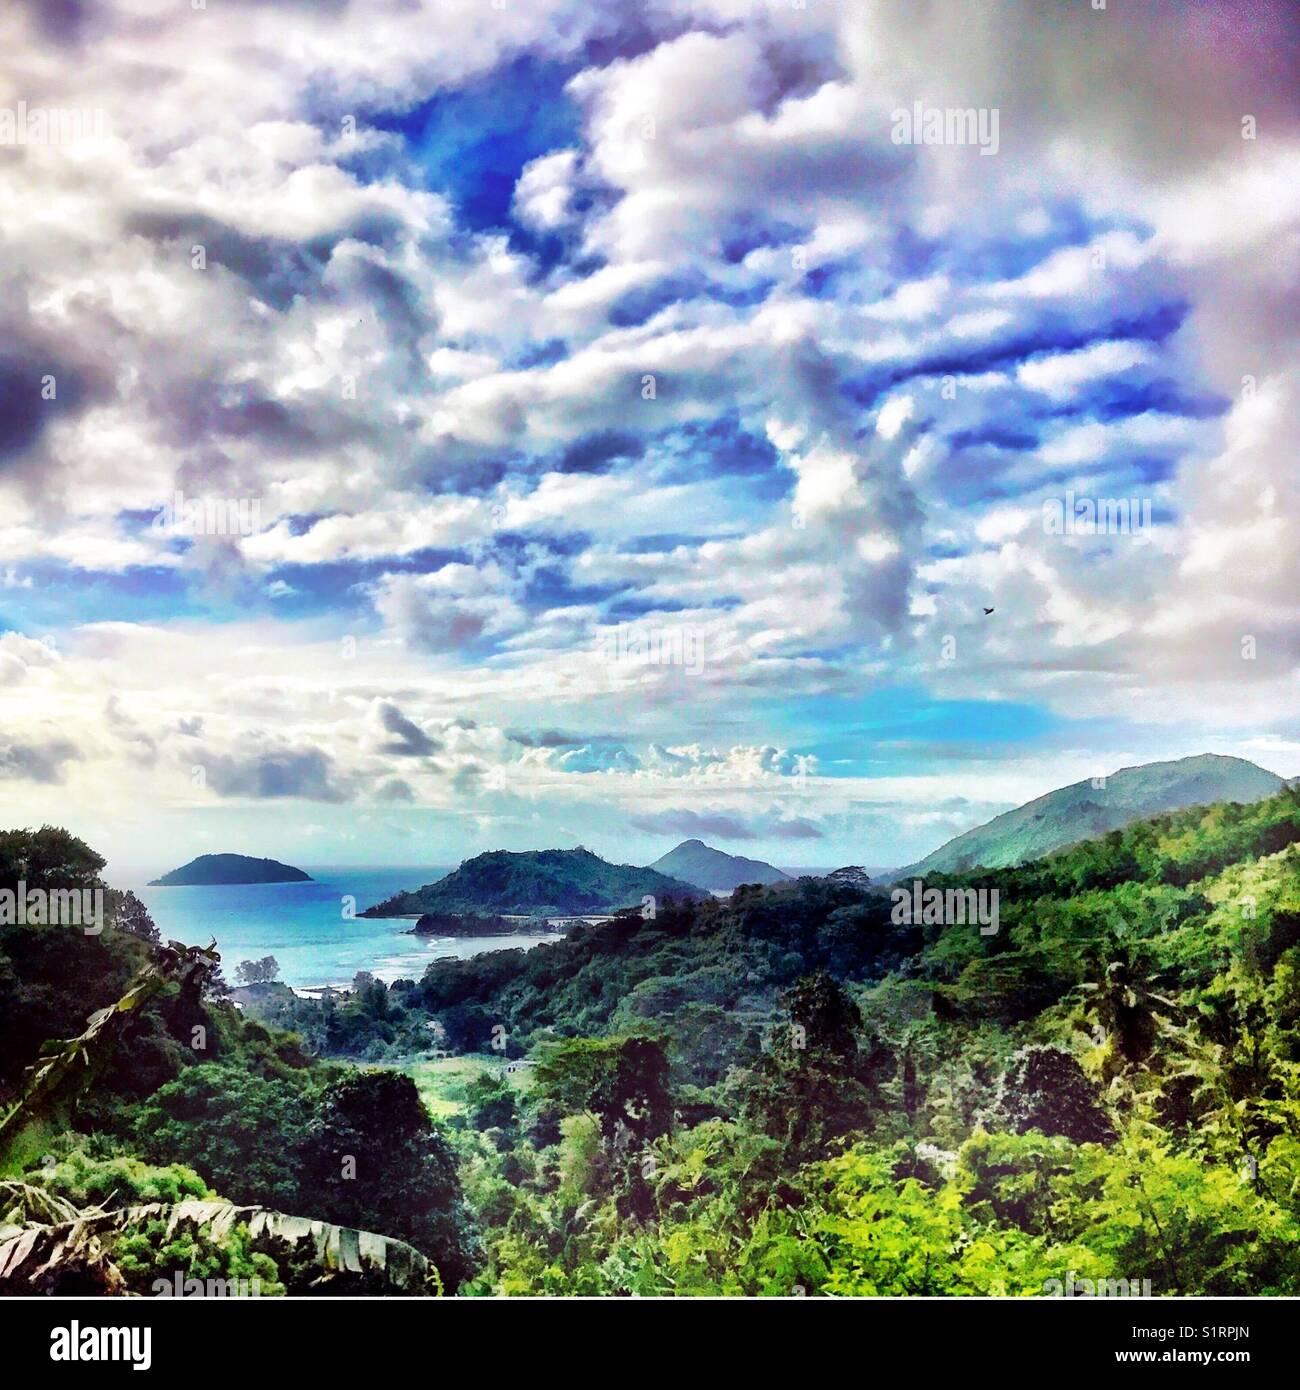 Mahe island Seychelles - Stock Image